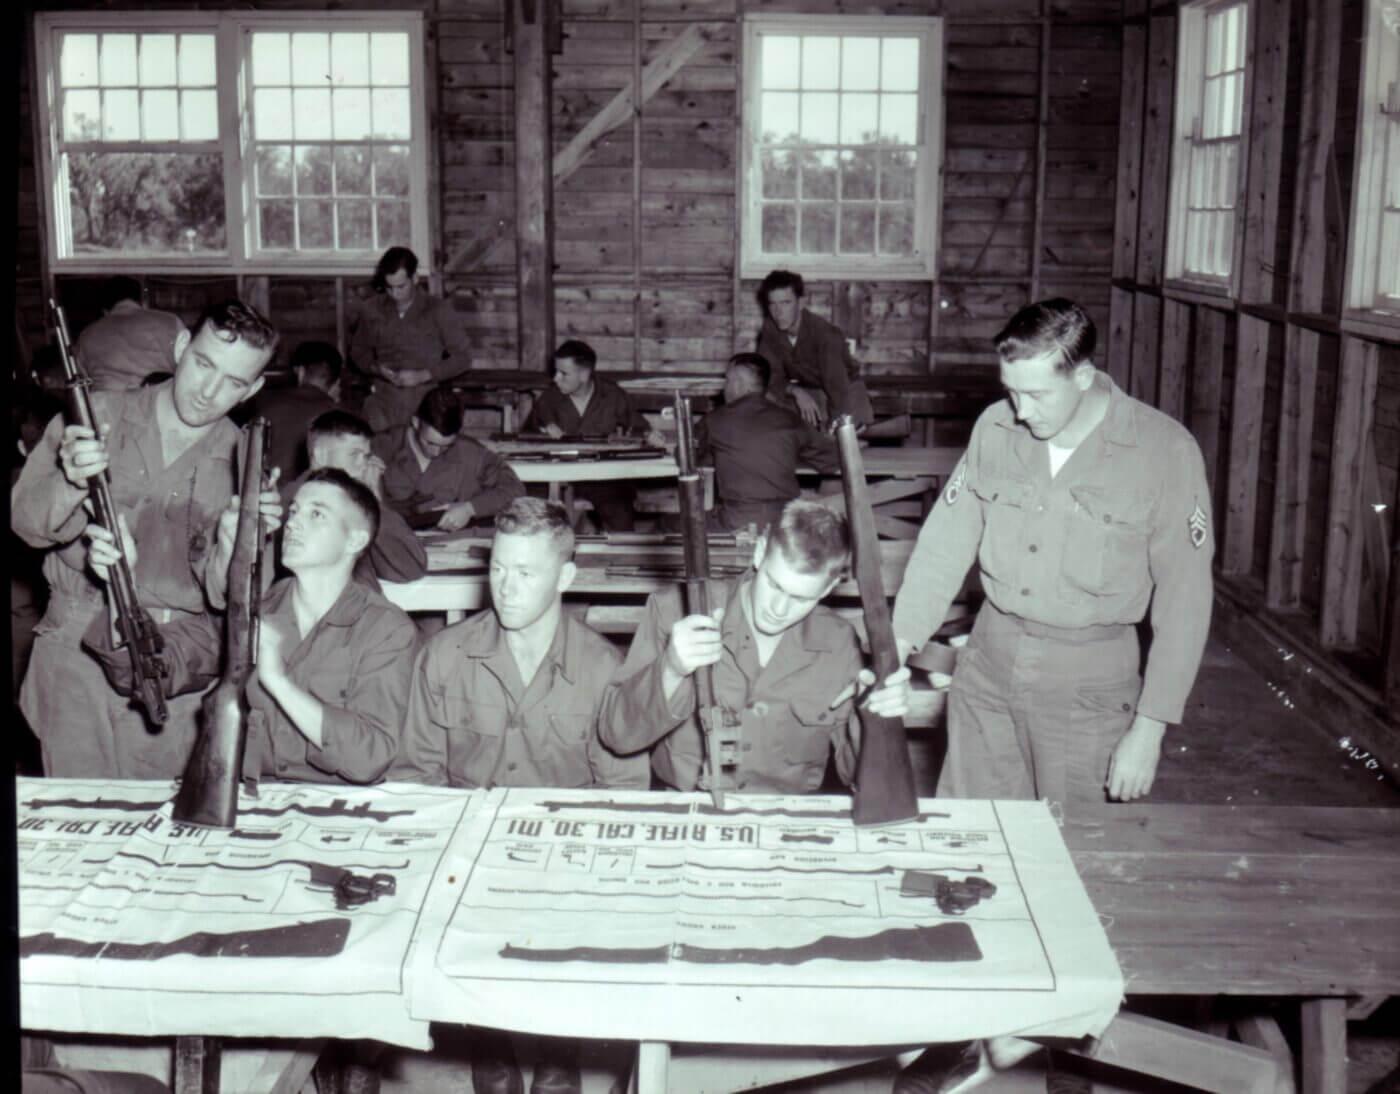 M1 rifle instruction mat